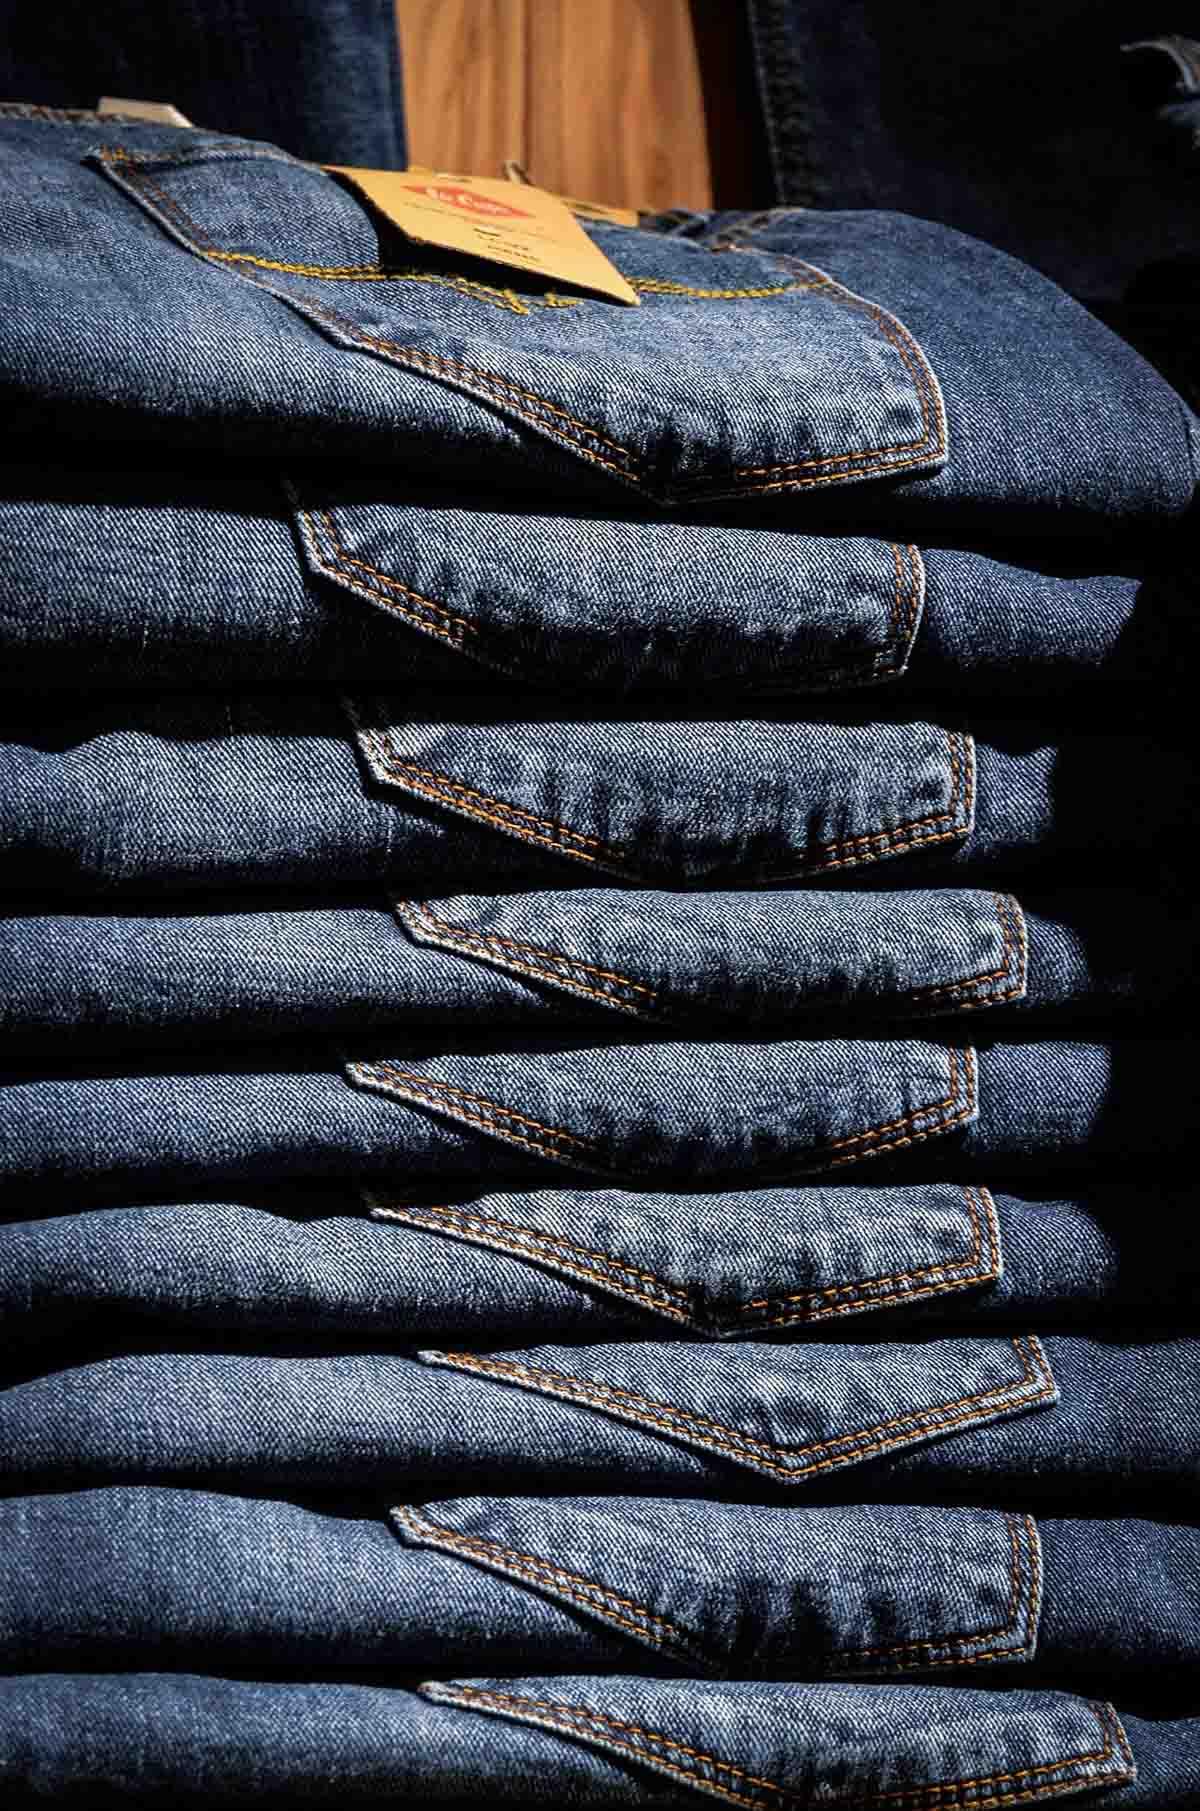 Jeanshose Denim Jeans